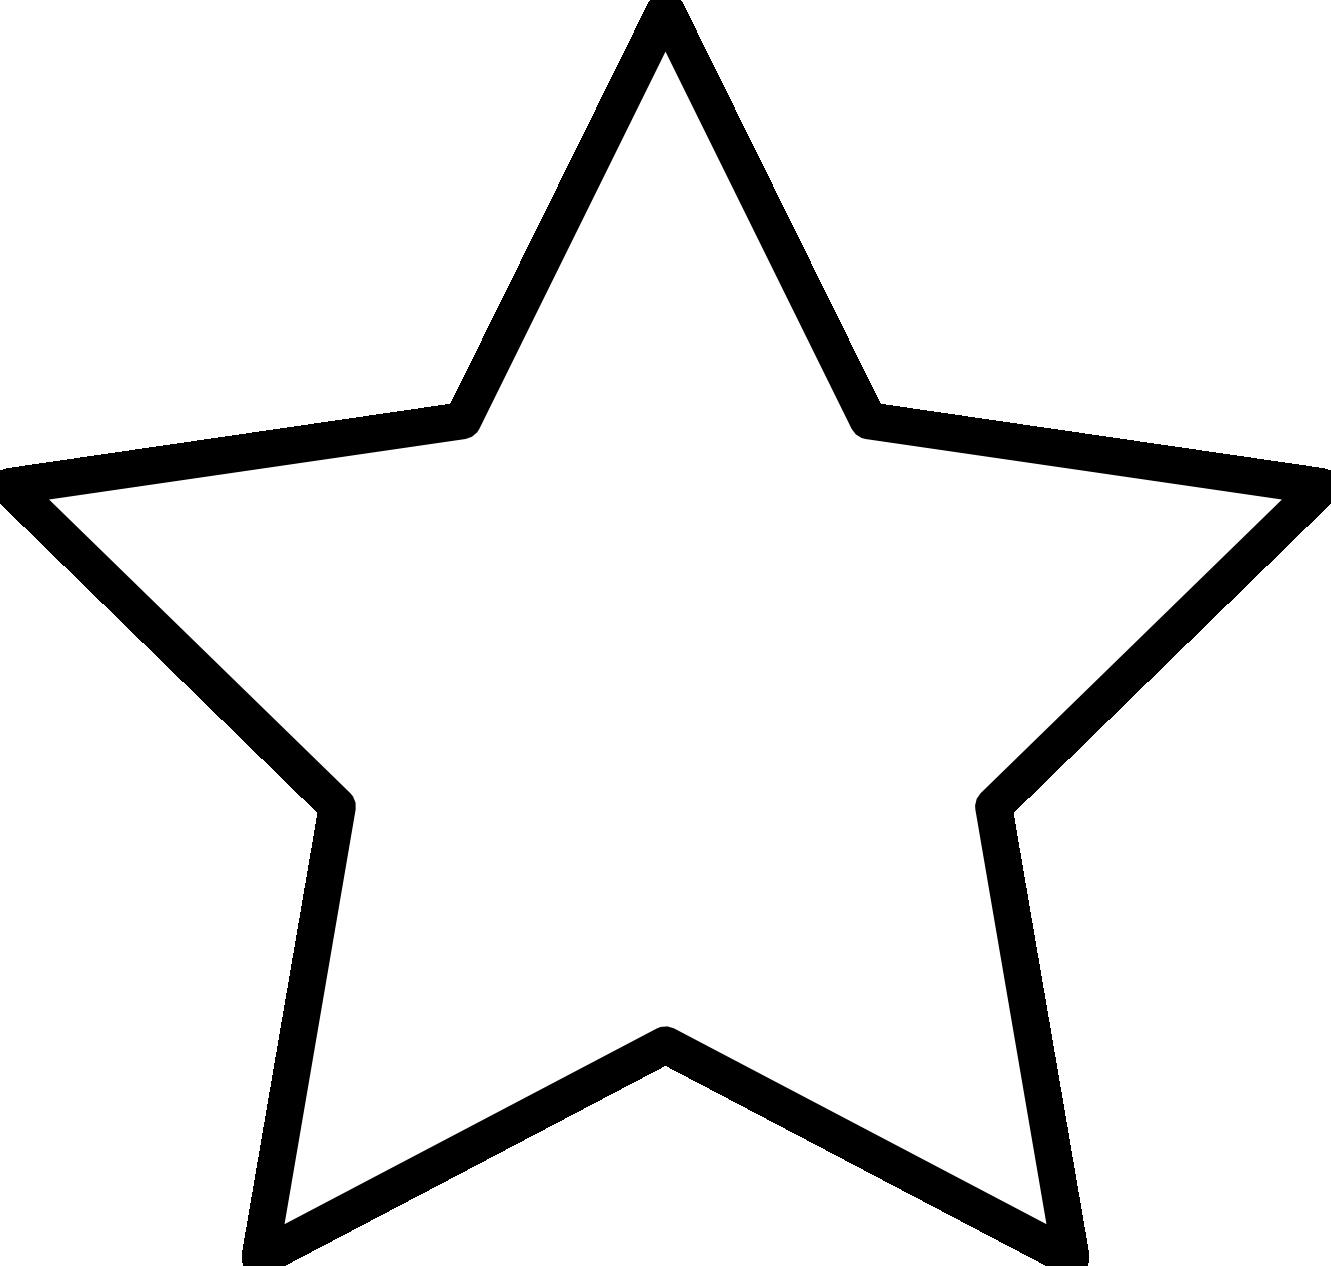 1331x1266 Star Clip Art Outline Black And White Clipart Panda